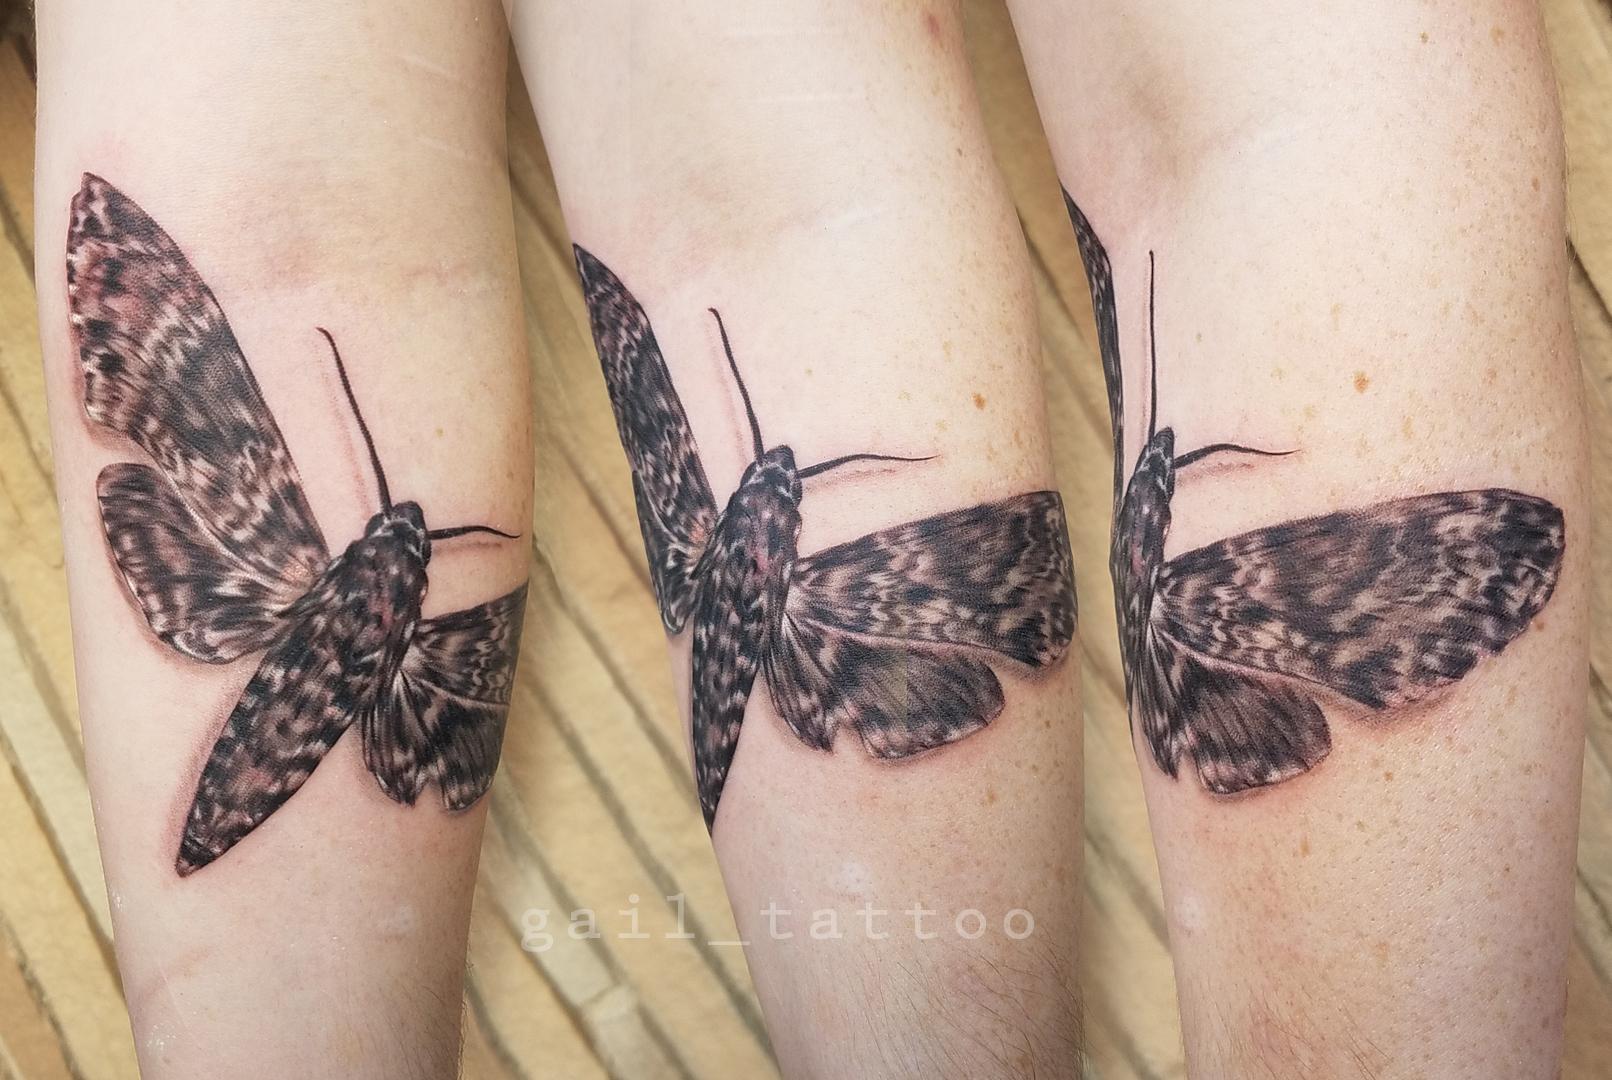 gailreilly_moth.jpg